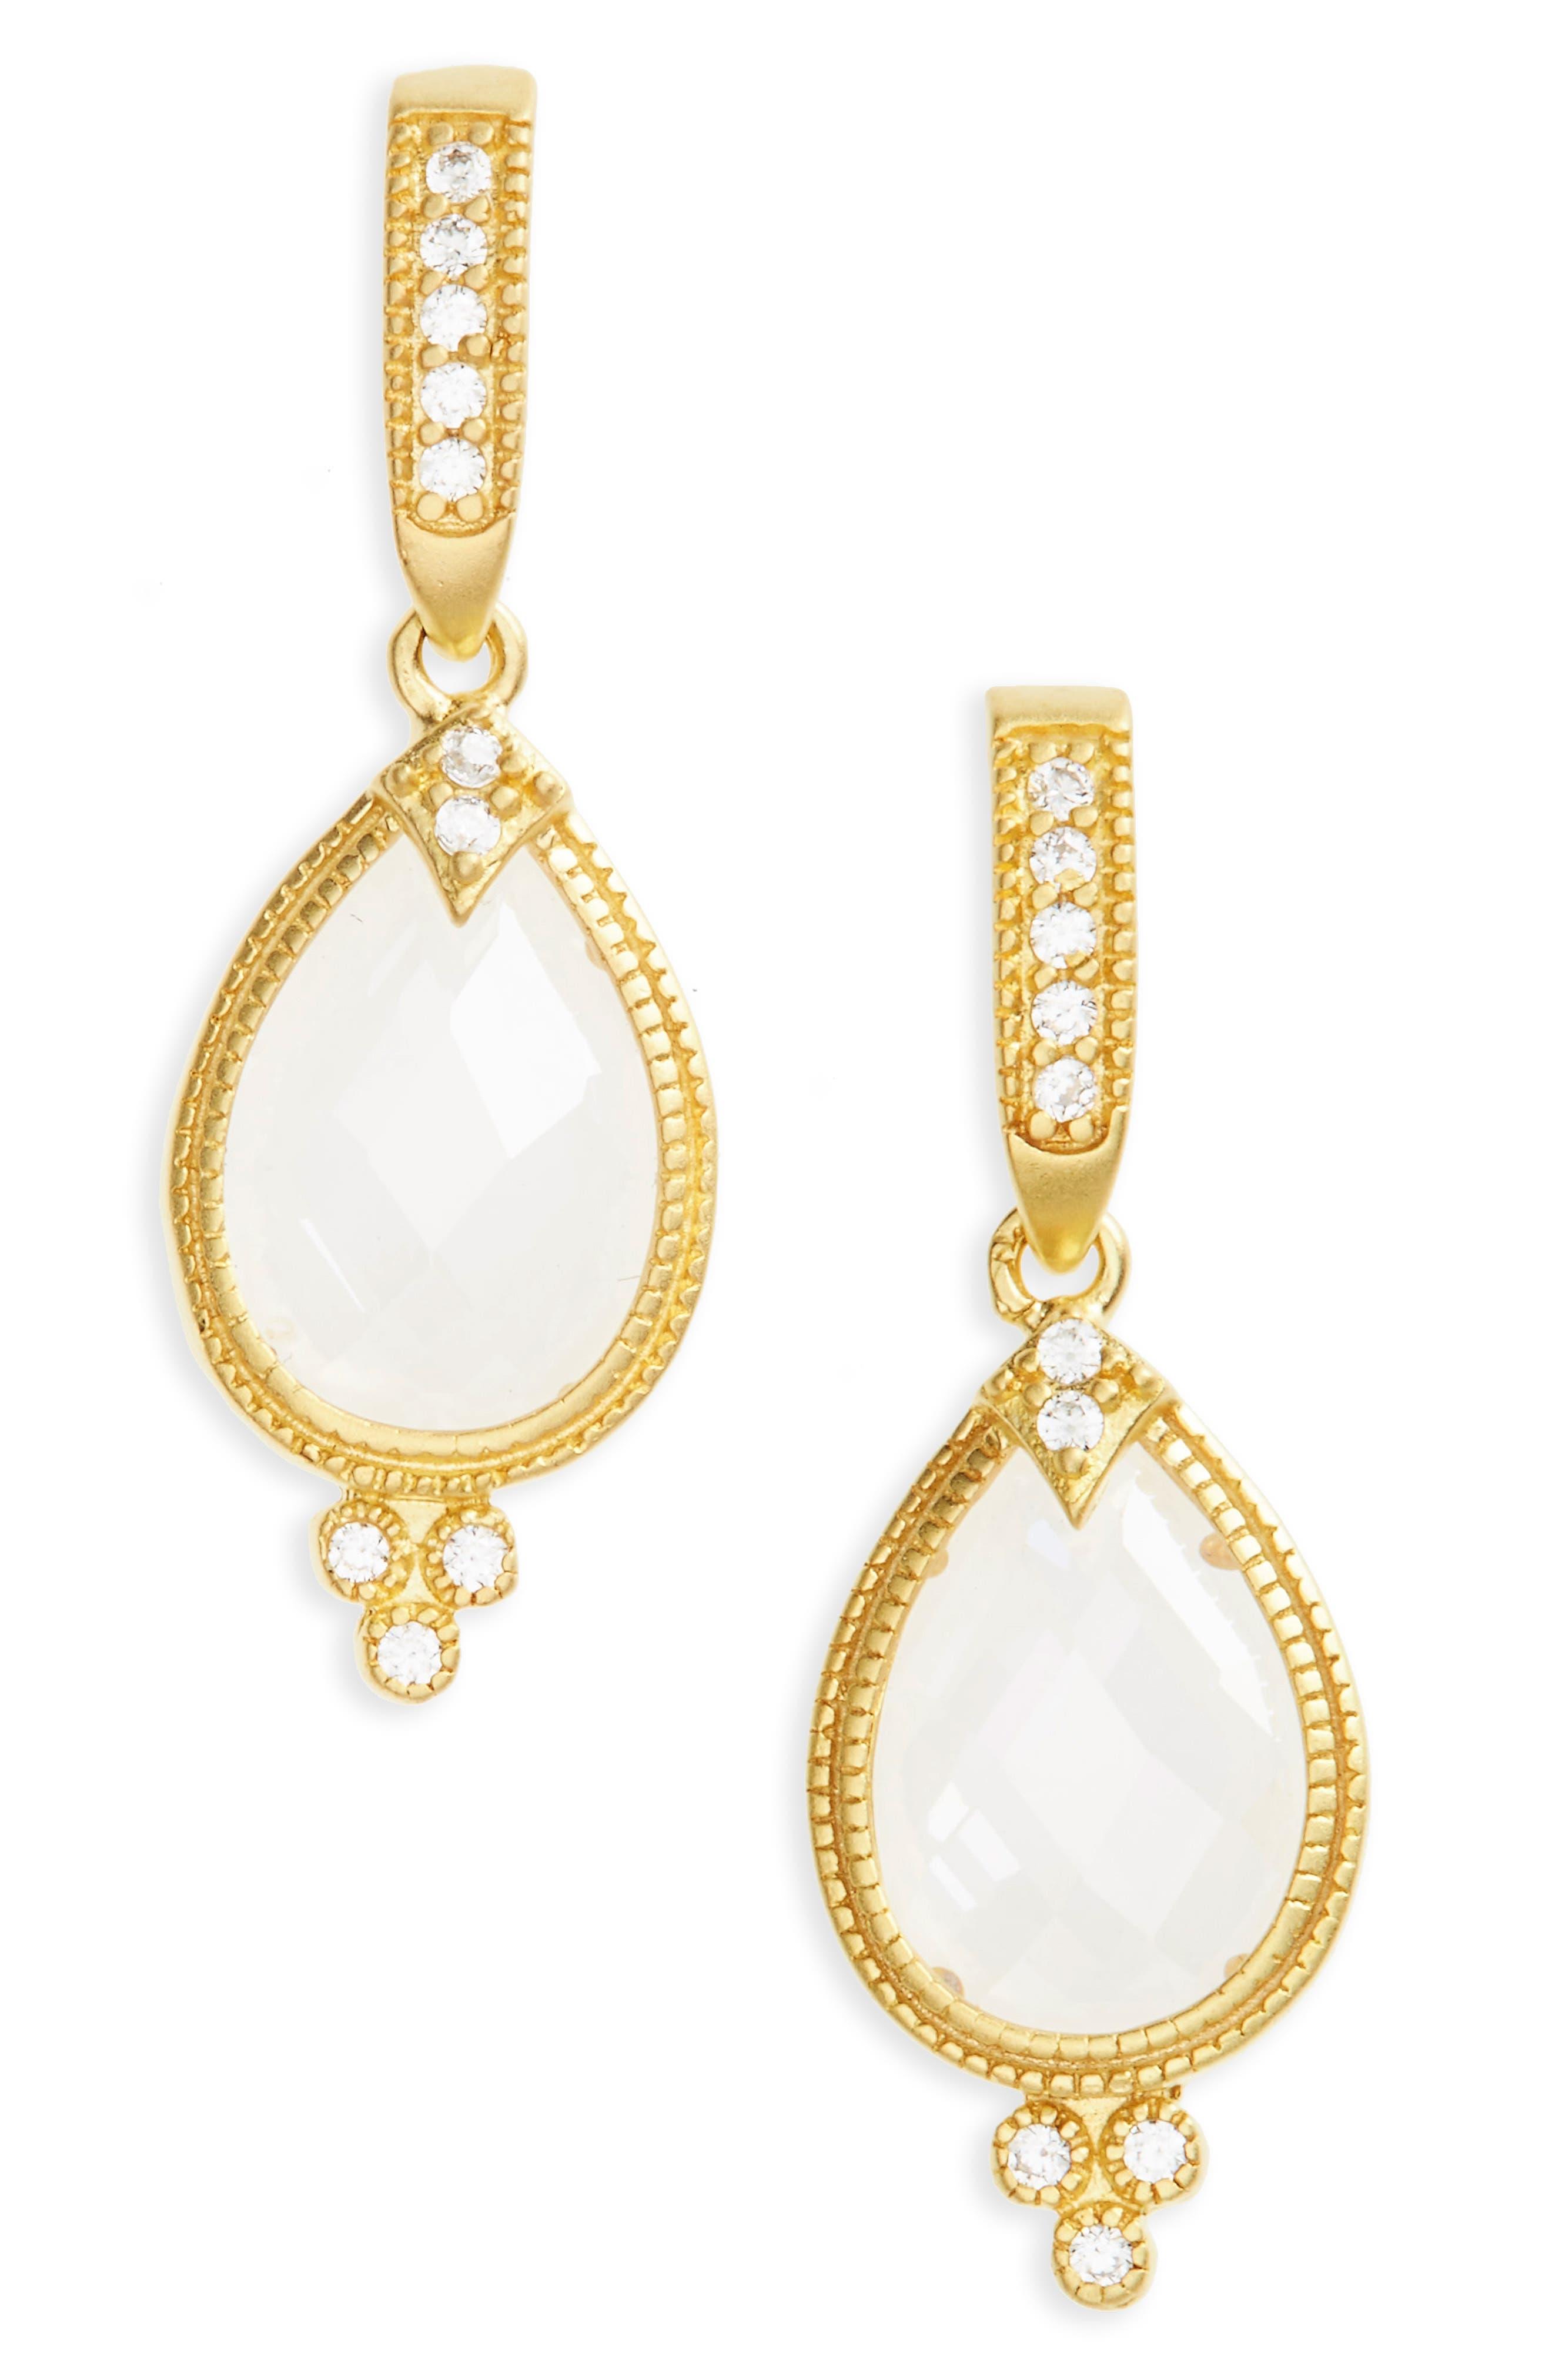 Audrey Teardrop Earrings,                         Main,                         color, Gold/ Clear